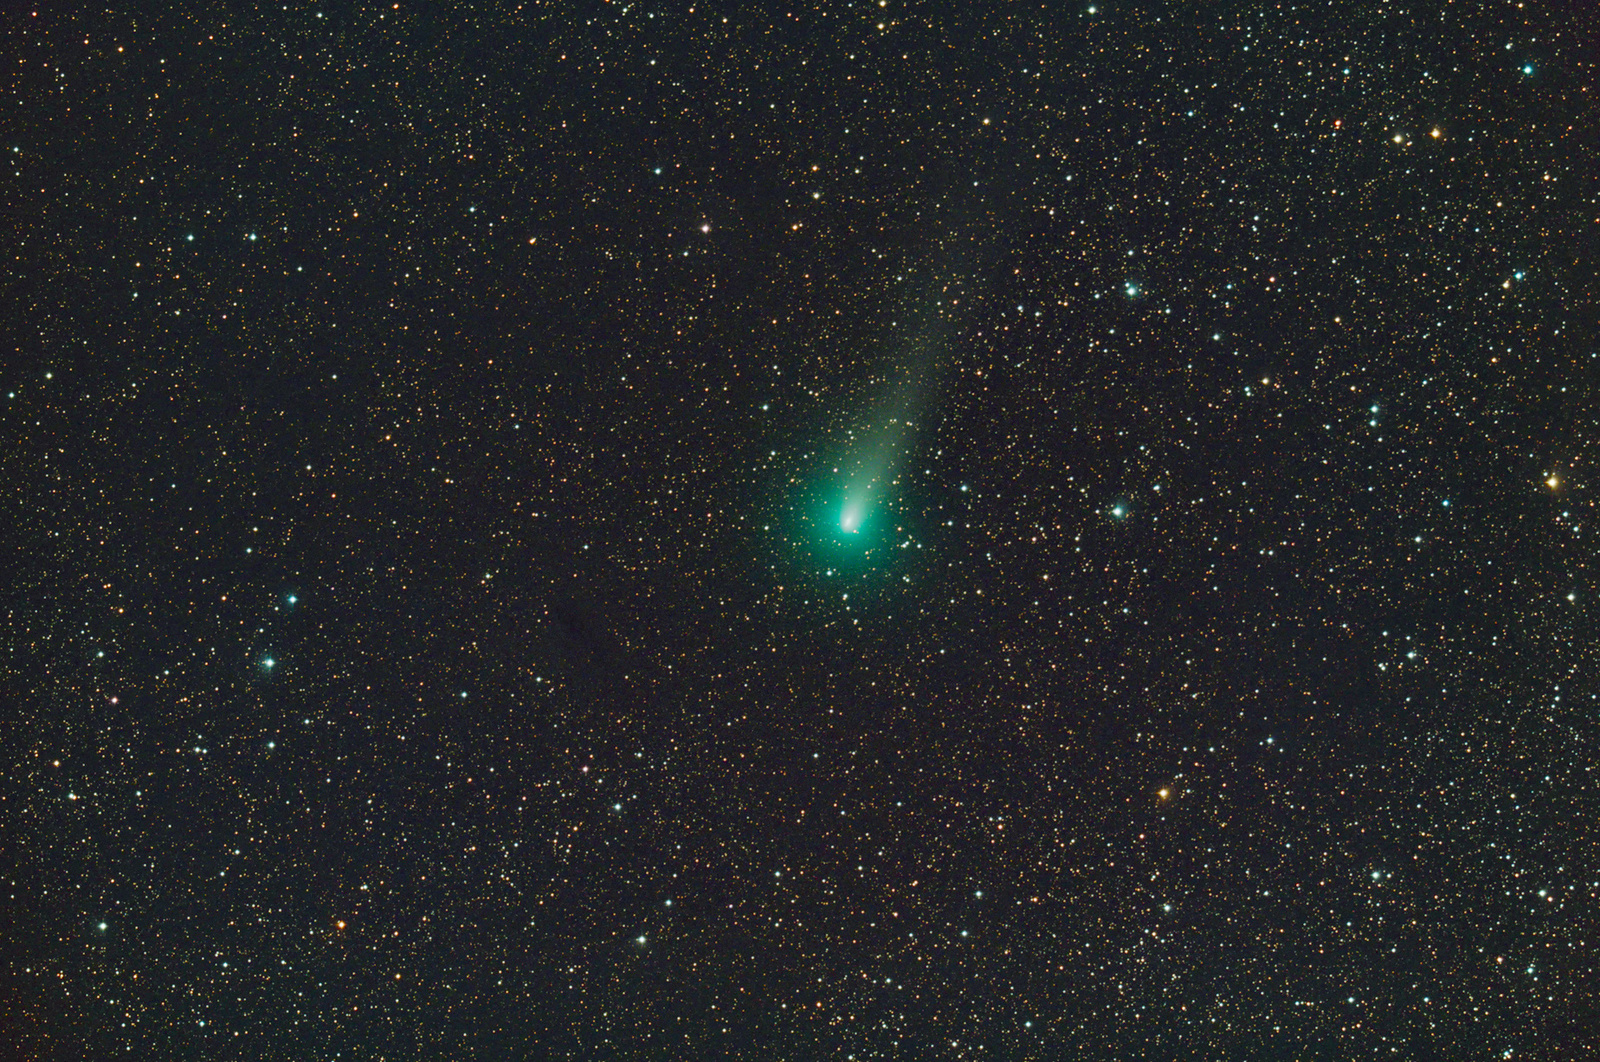 comet 15x60s rasa sml.jpg